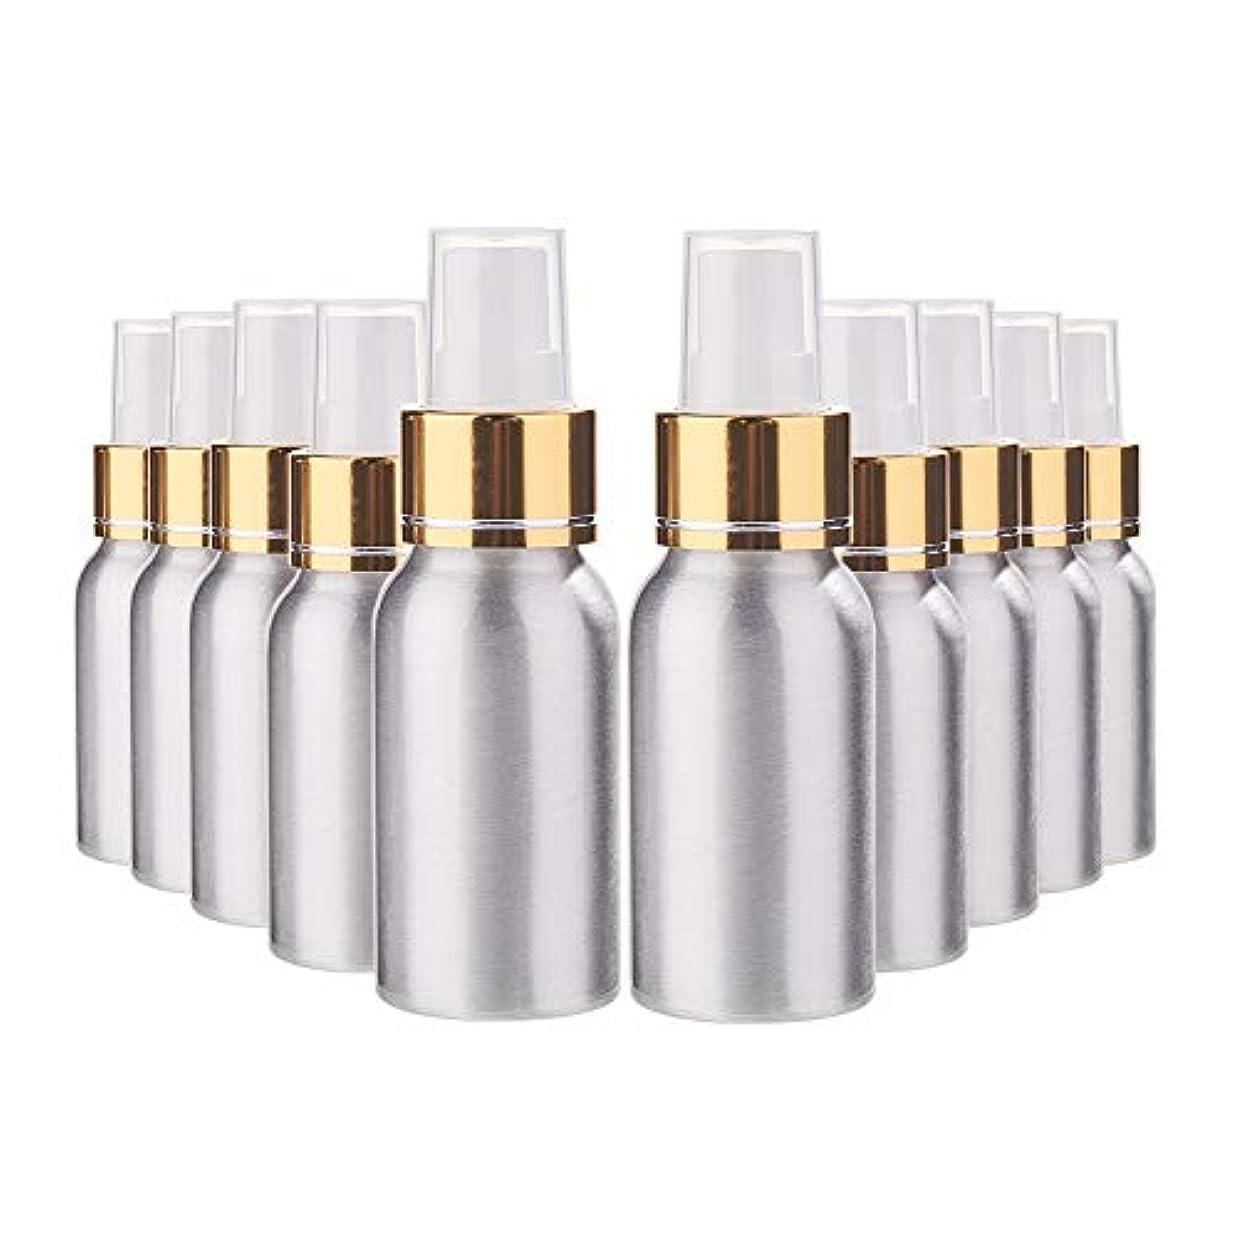 BENECREAT 10個セット50mlスプレーアルミボトル 空ボトル 極細のミスト 防錆 軽量 化粧品 香水 小分け 詰め替え